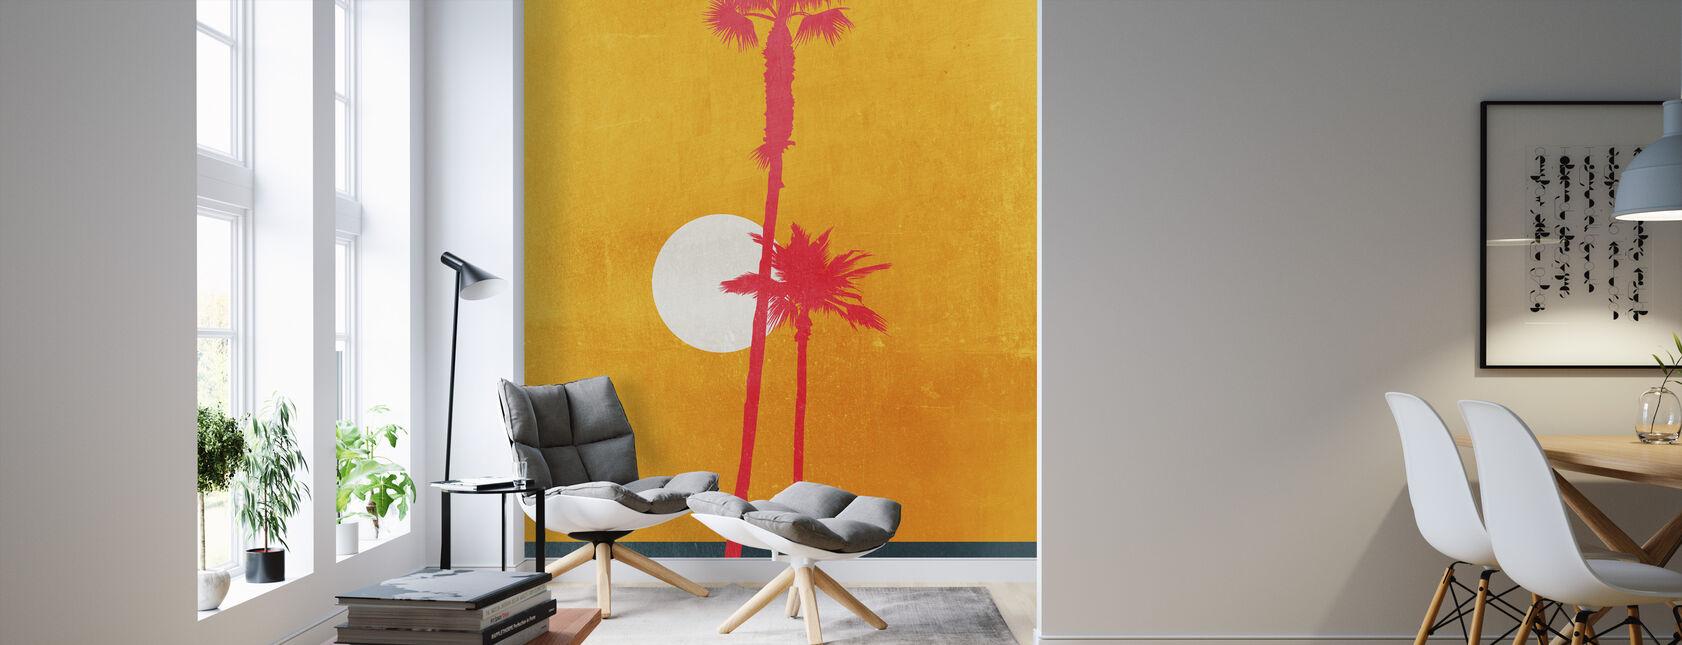 La Palma Sunshine - Wallpaper - Living Room